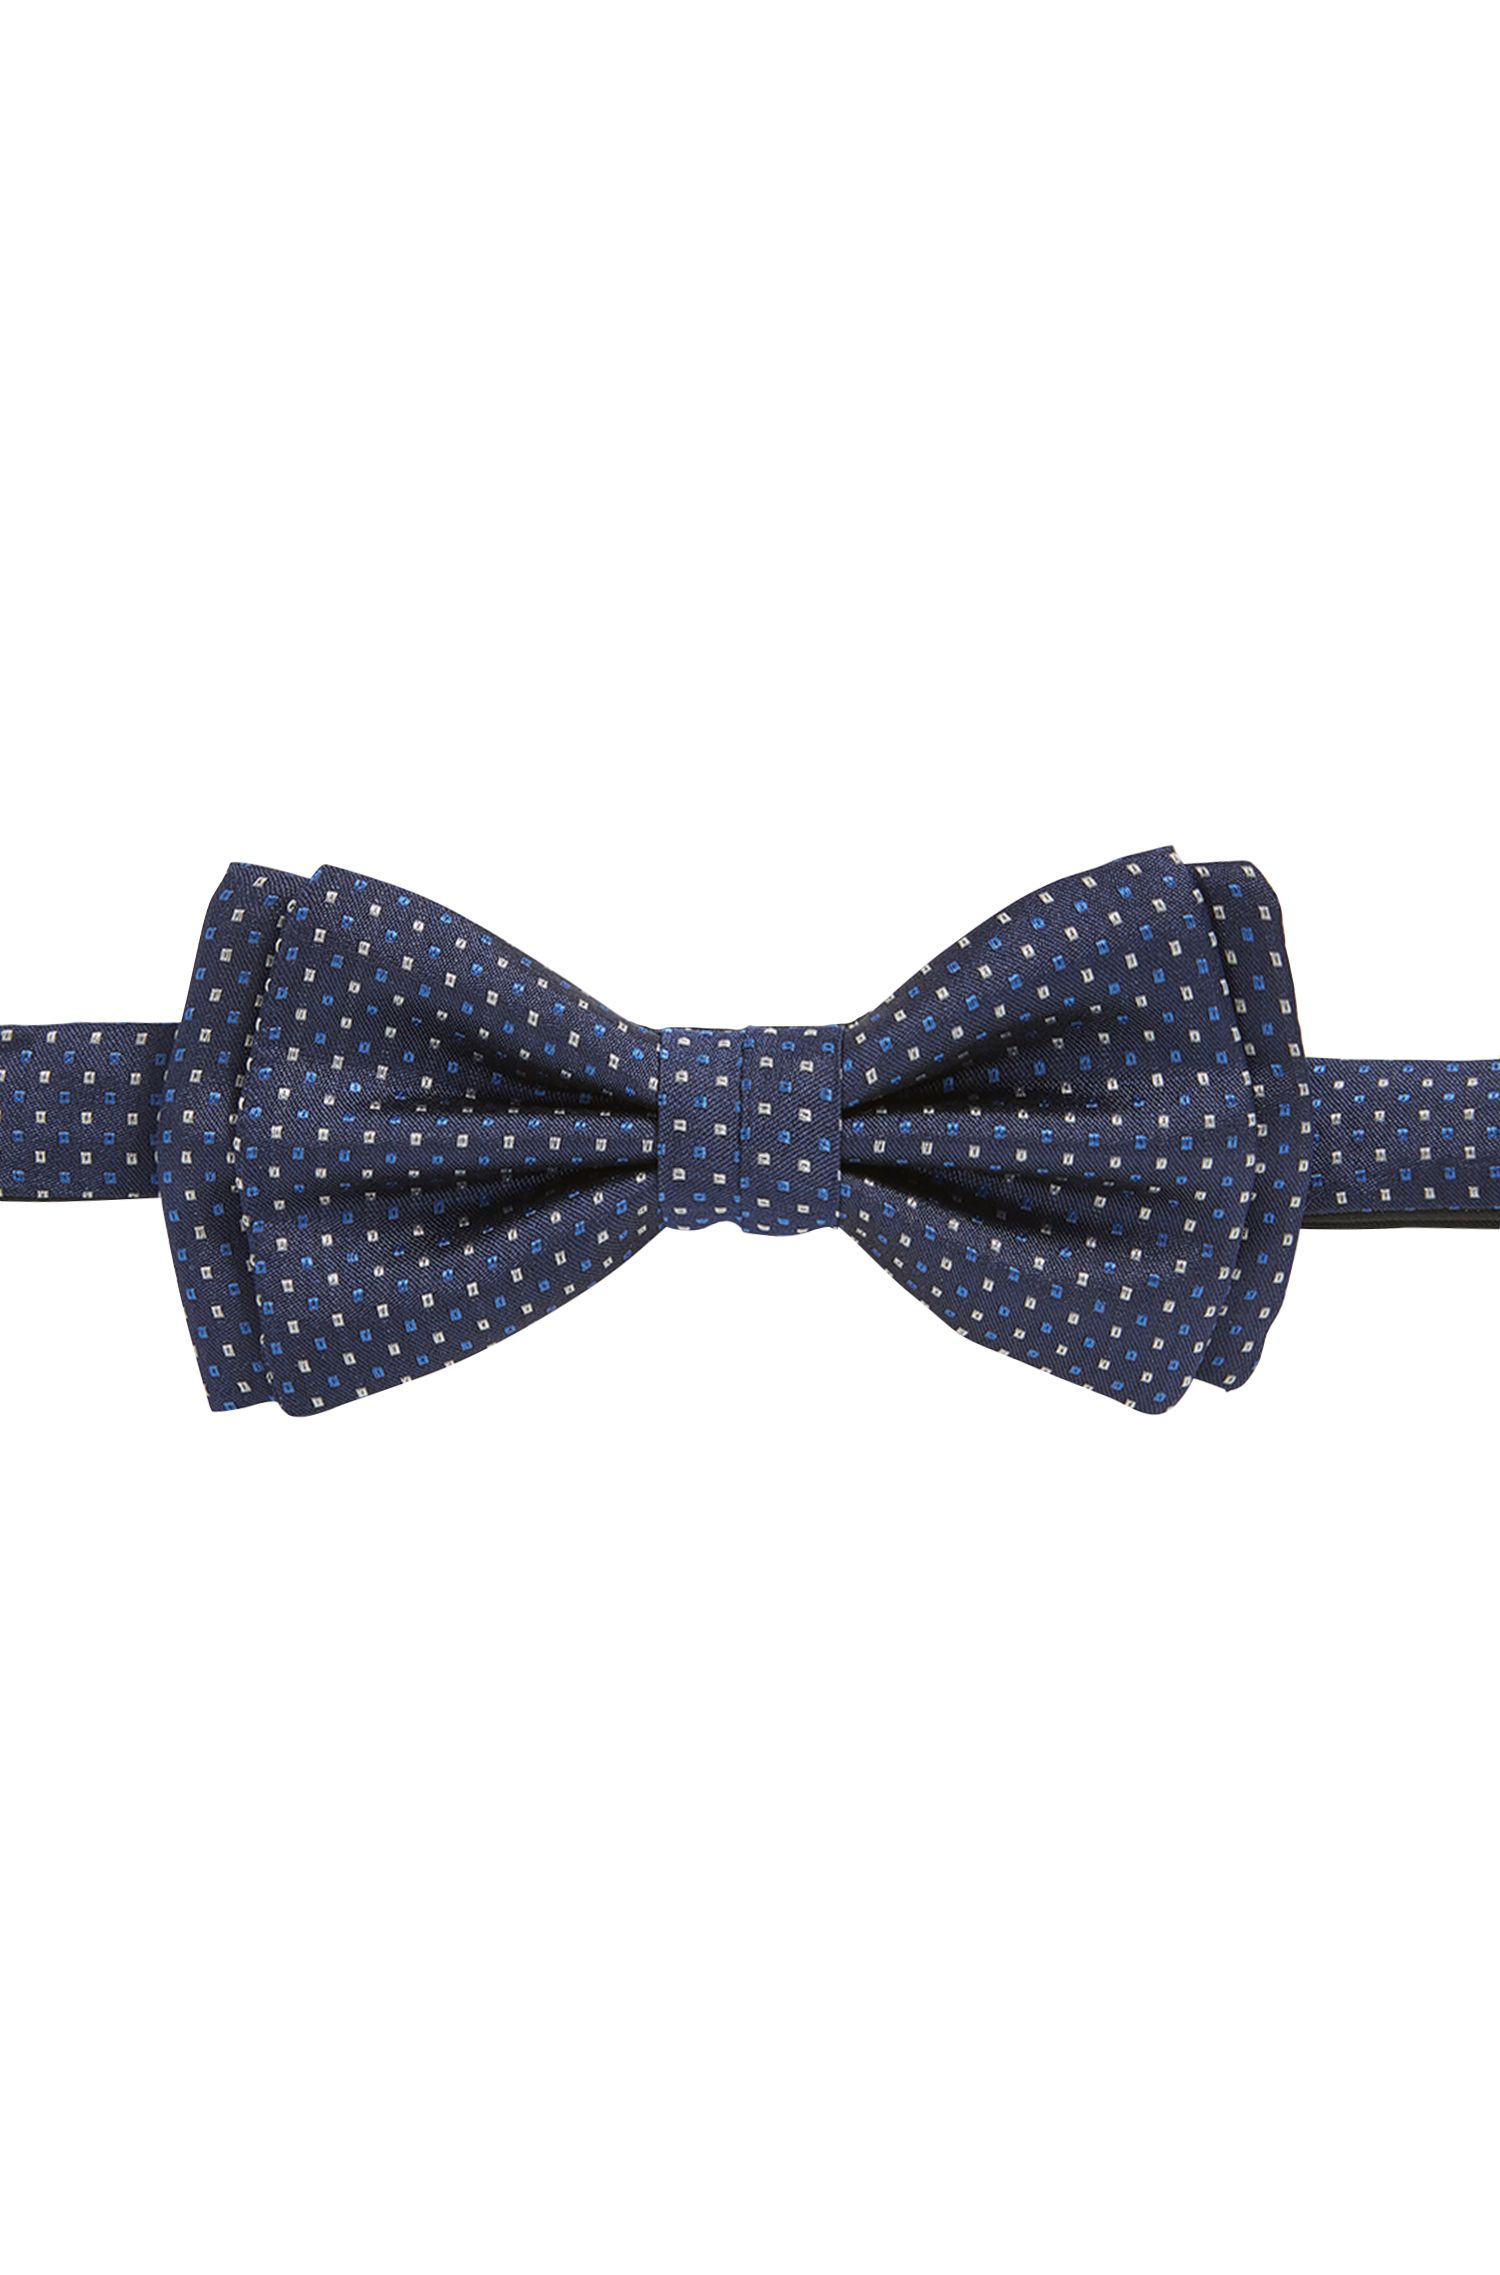 Micro-pattern bow tie in rich silk